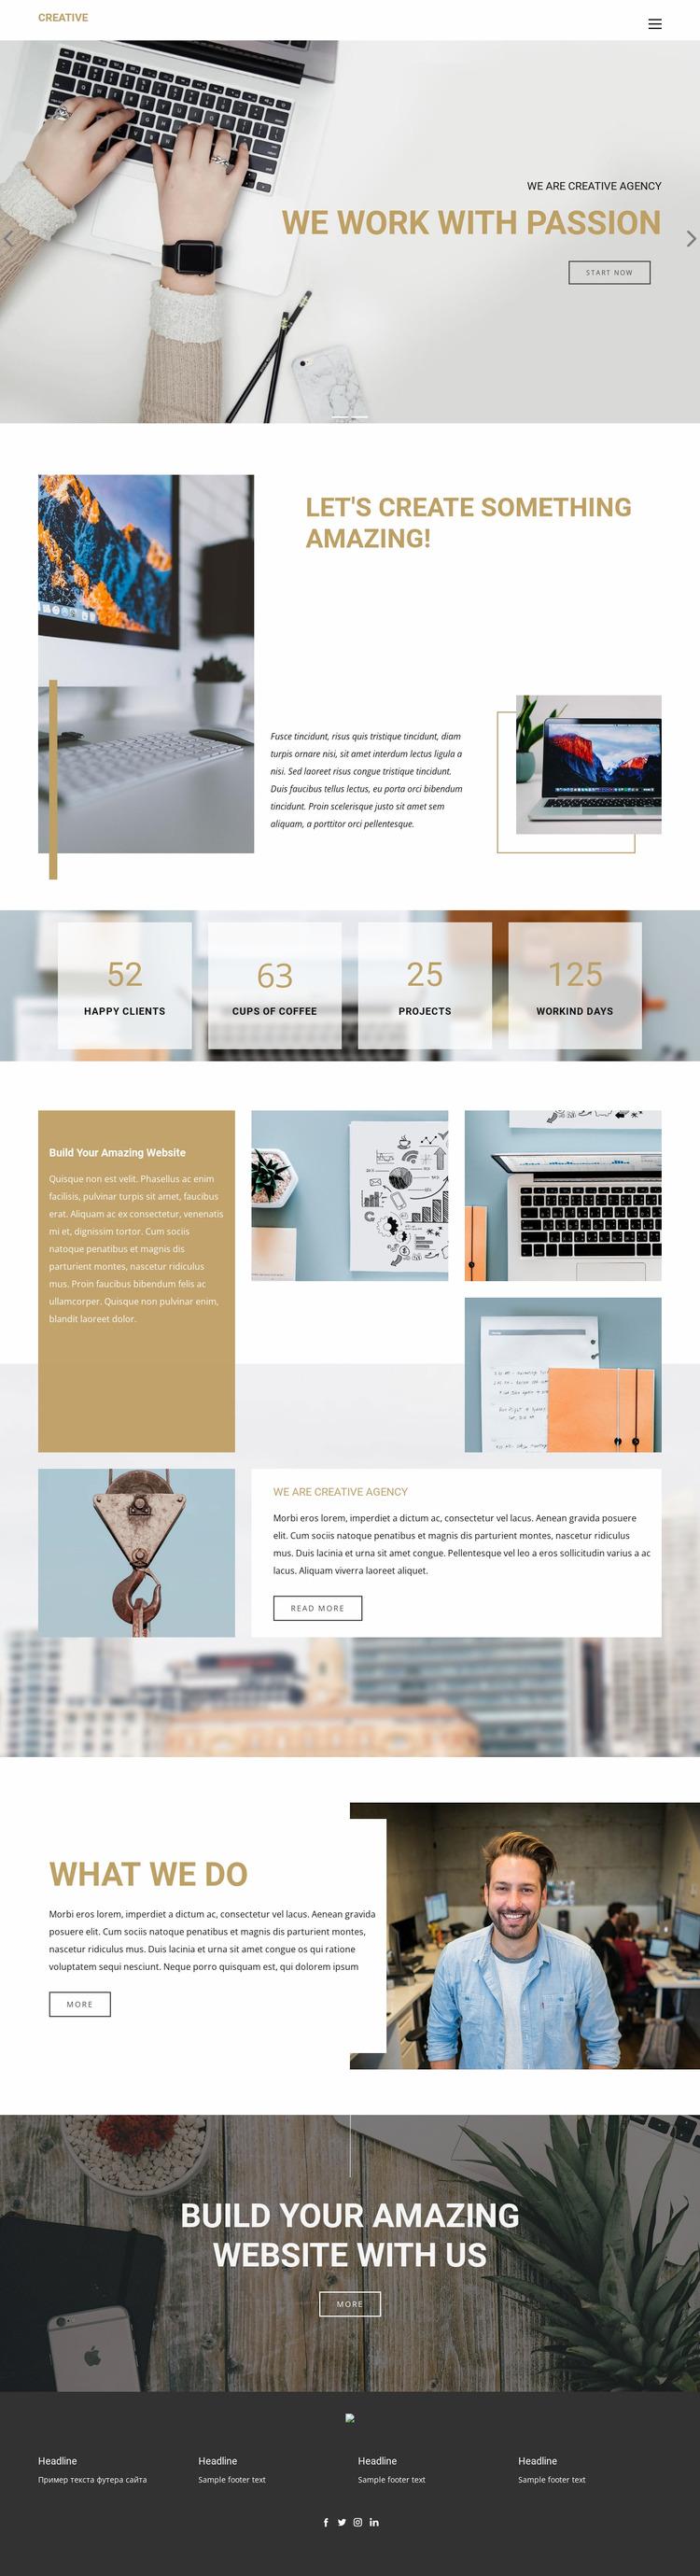 Exceptional creative designs WordPress Website Builder